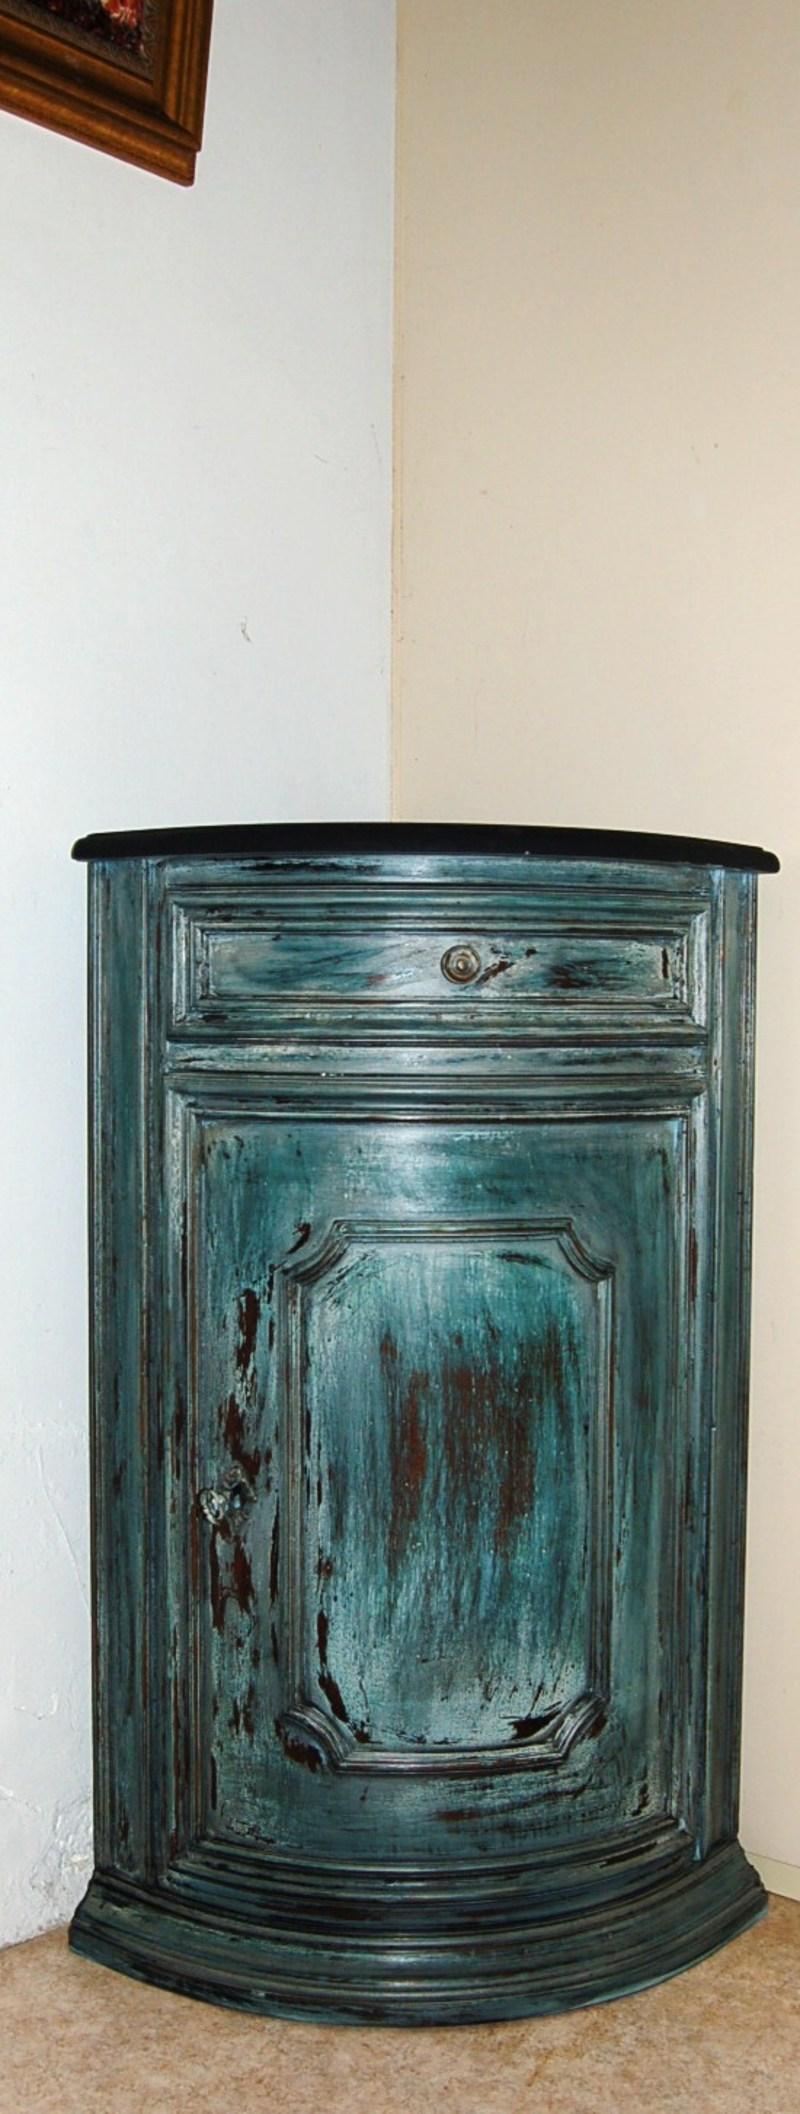 Meuble d 39 angle d 39 appoint patin Petit meuble d angle